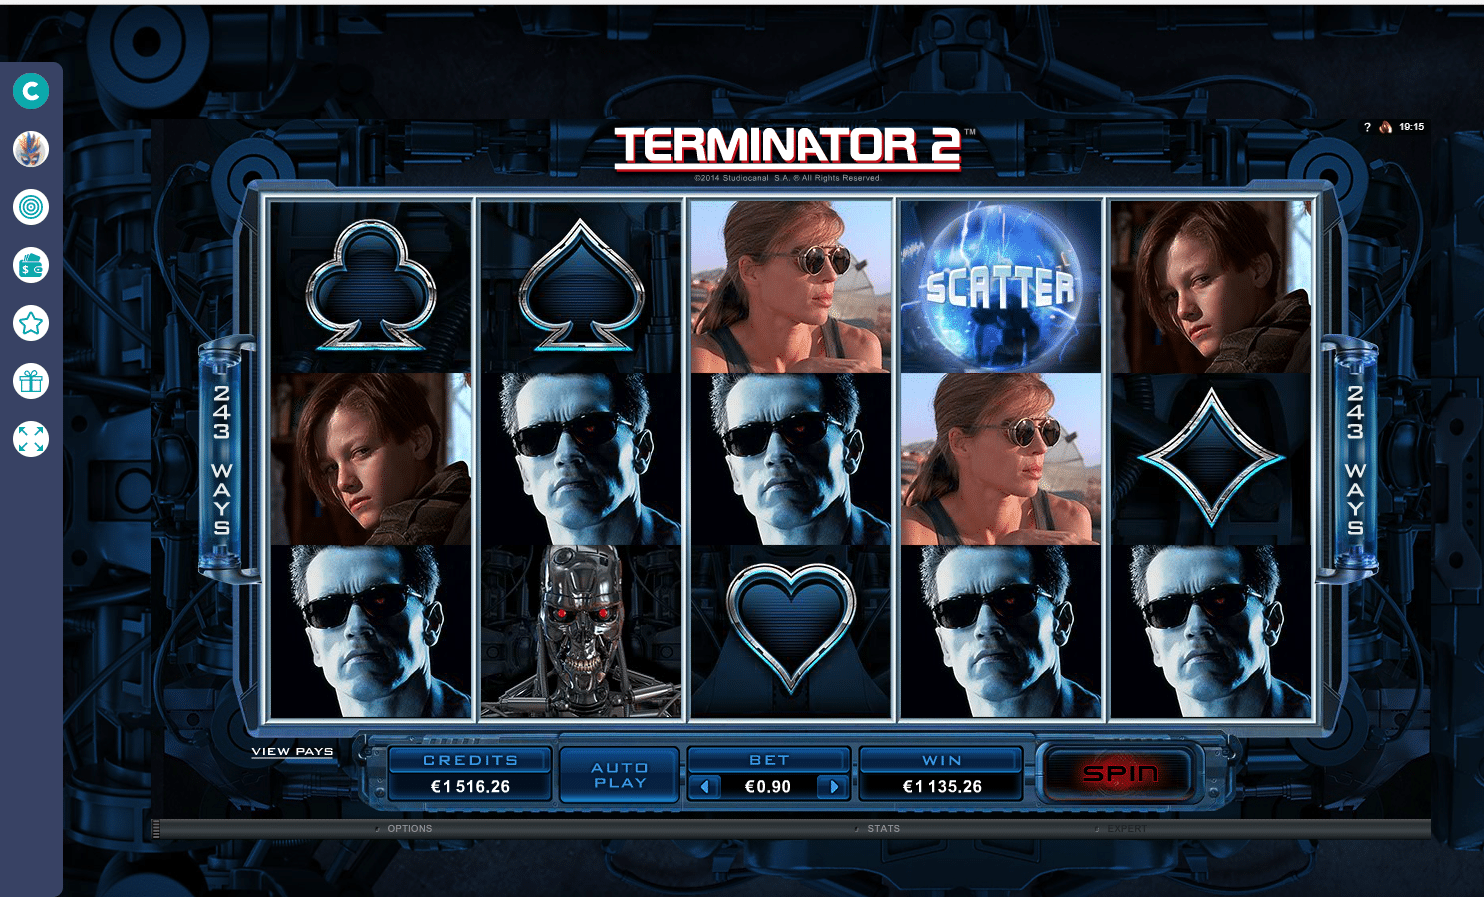 Terminator 2 Hot mode Slot Big Win Picture